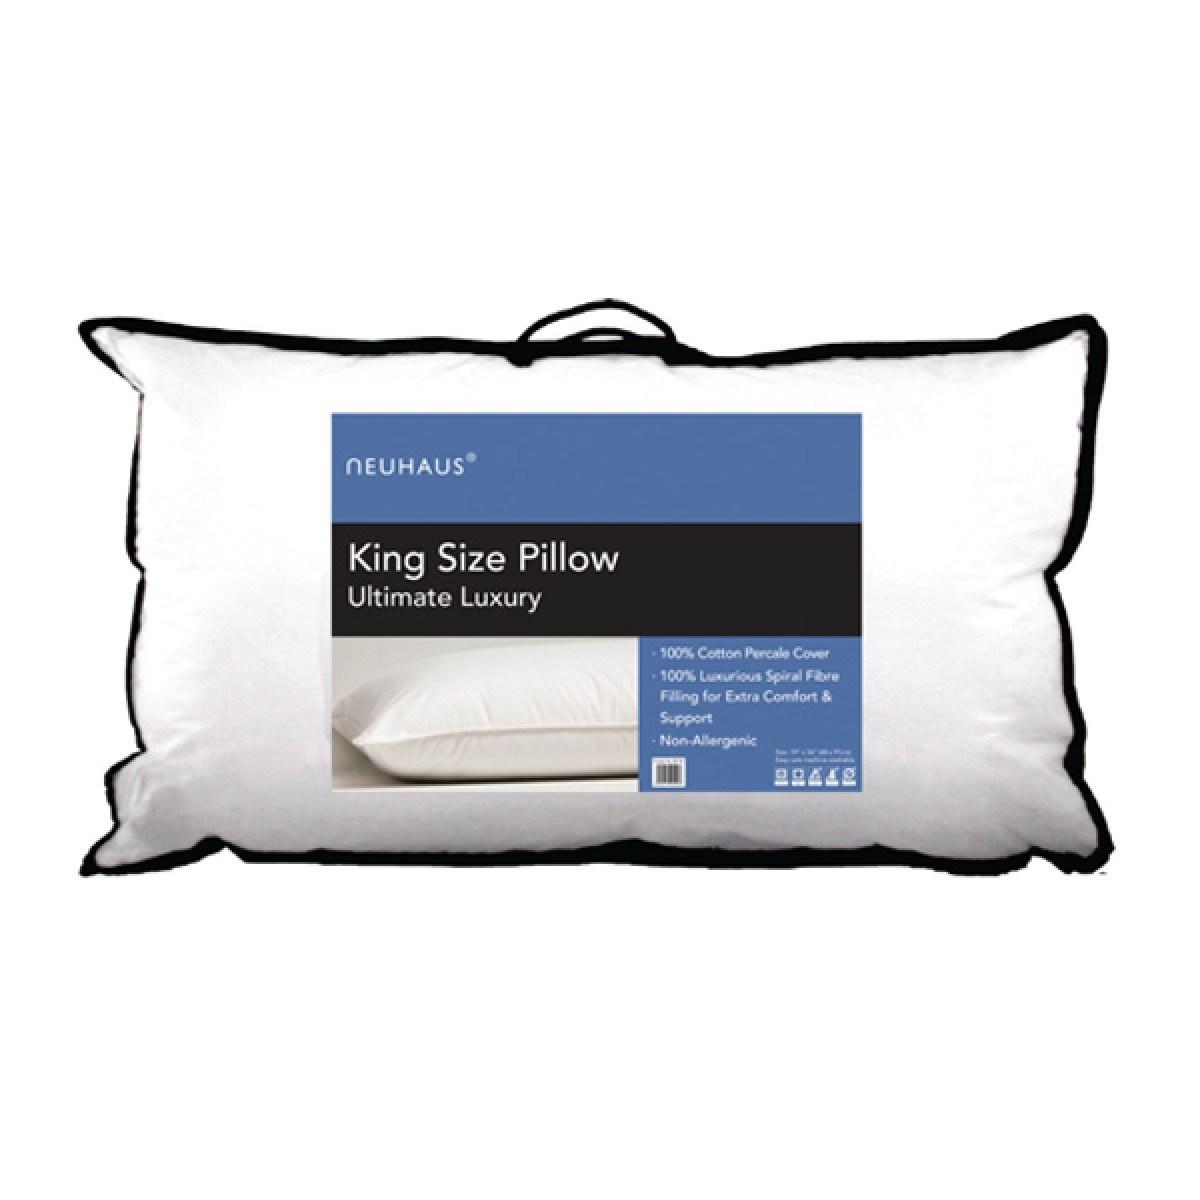 neu haus king size 100per cent cotton pillow. Black Bedroom Furniture Sets. Home Design Ideas